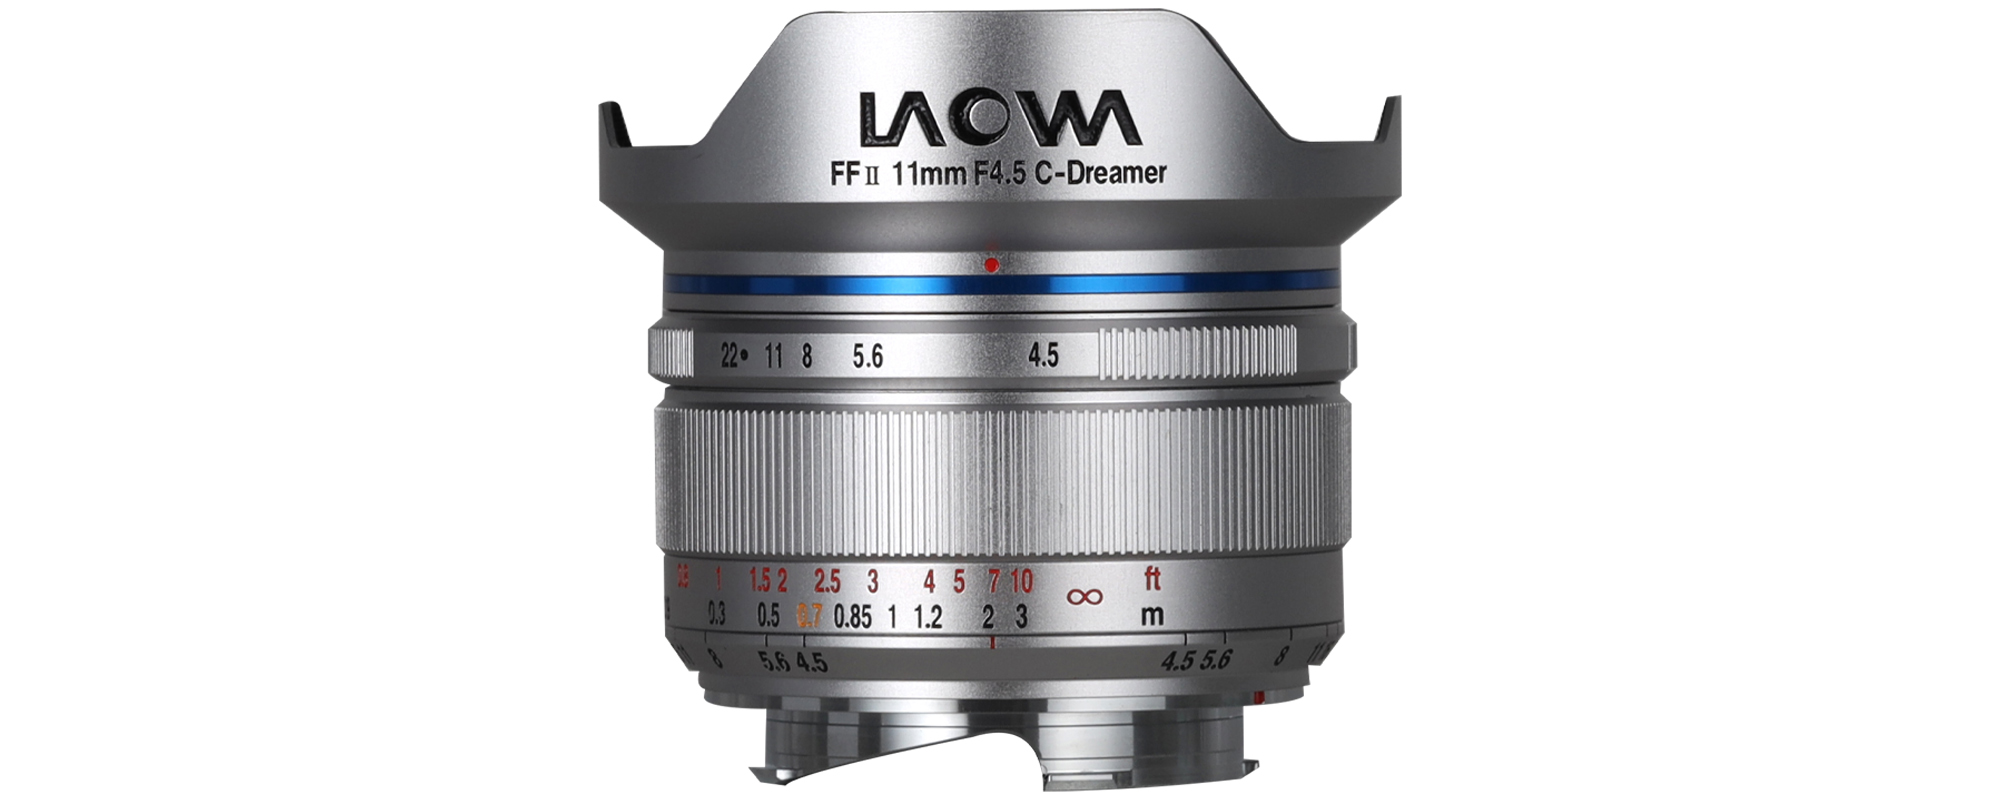 Venus Optics Laowa 11mm f/4.5 FF RL lens for Leica M - silver